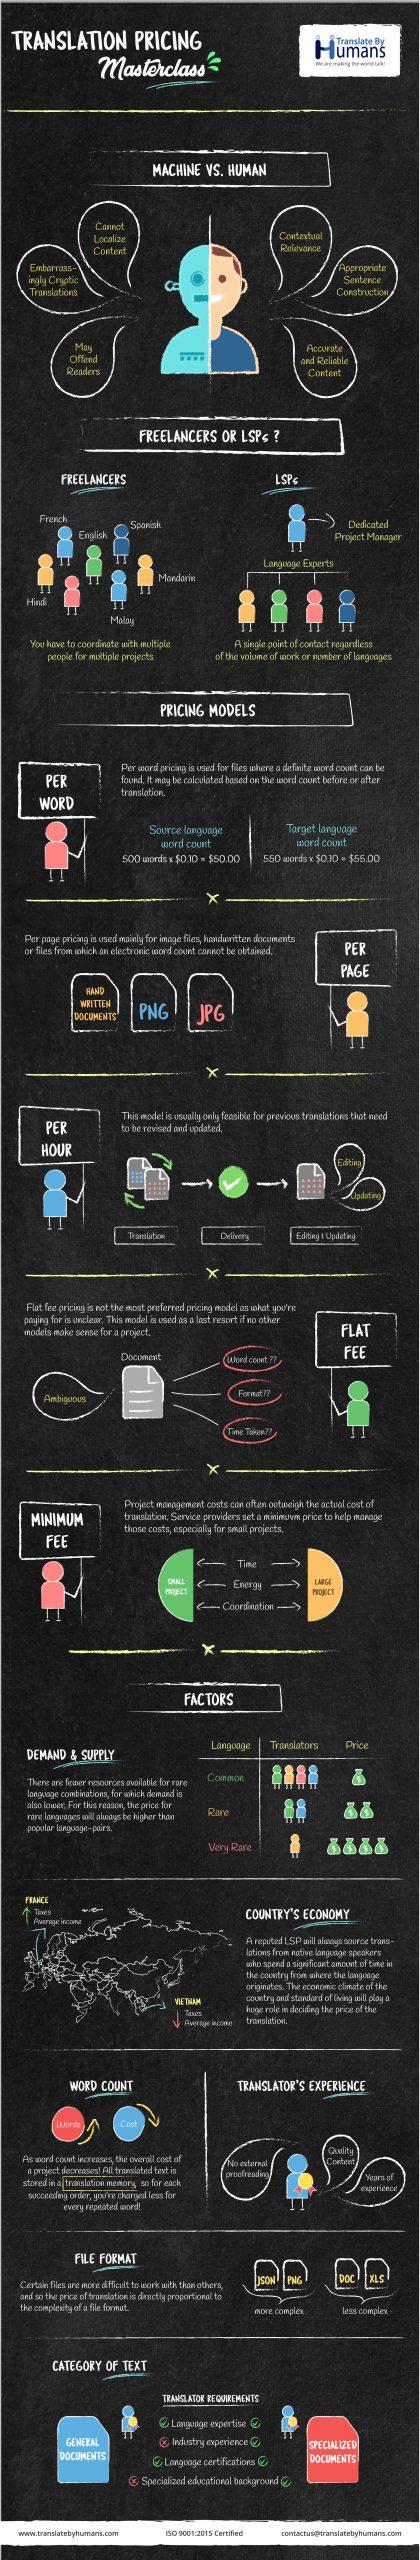 Translation Pricing Infographic